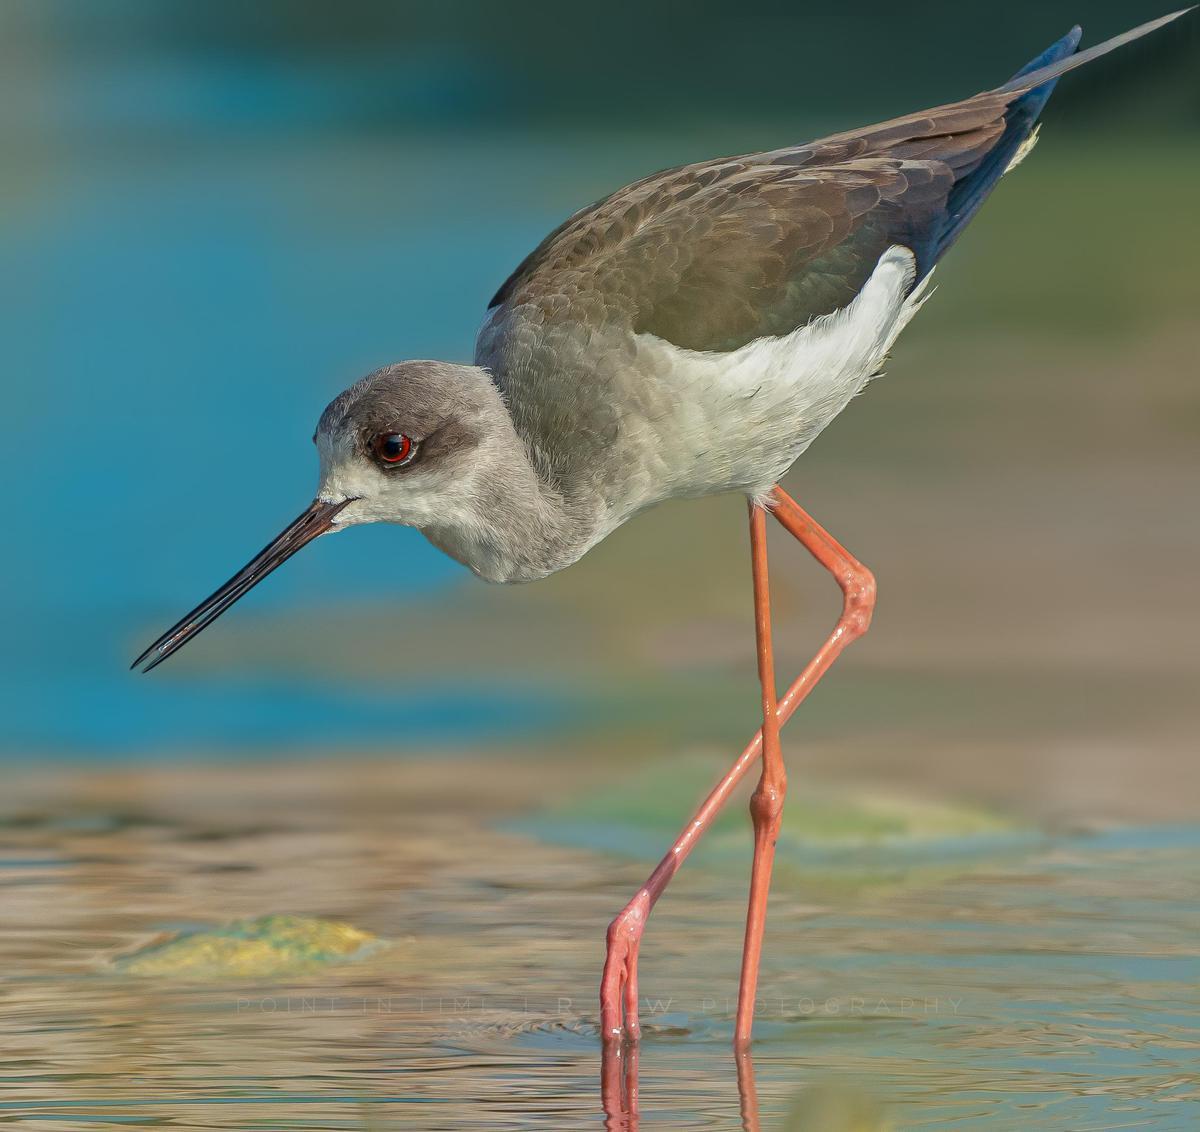 Image of Bird, Vertebrate, Beak, Shorebird, redshank, Wildlife etc.